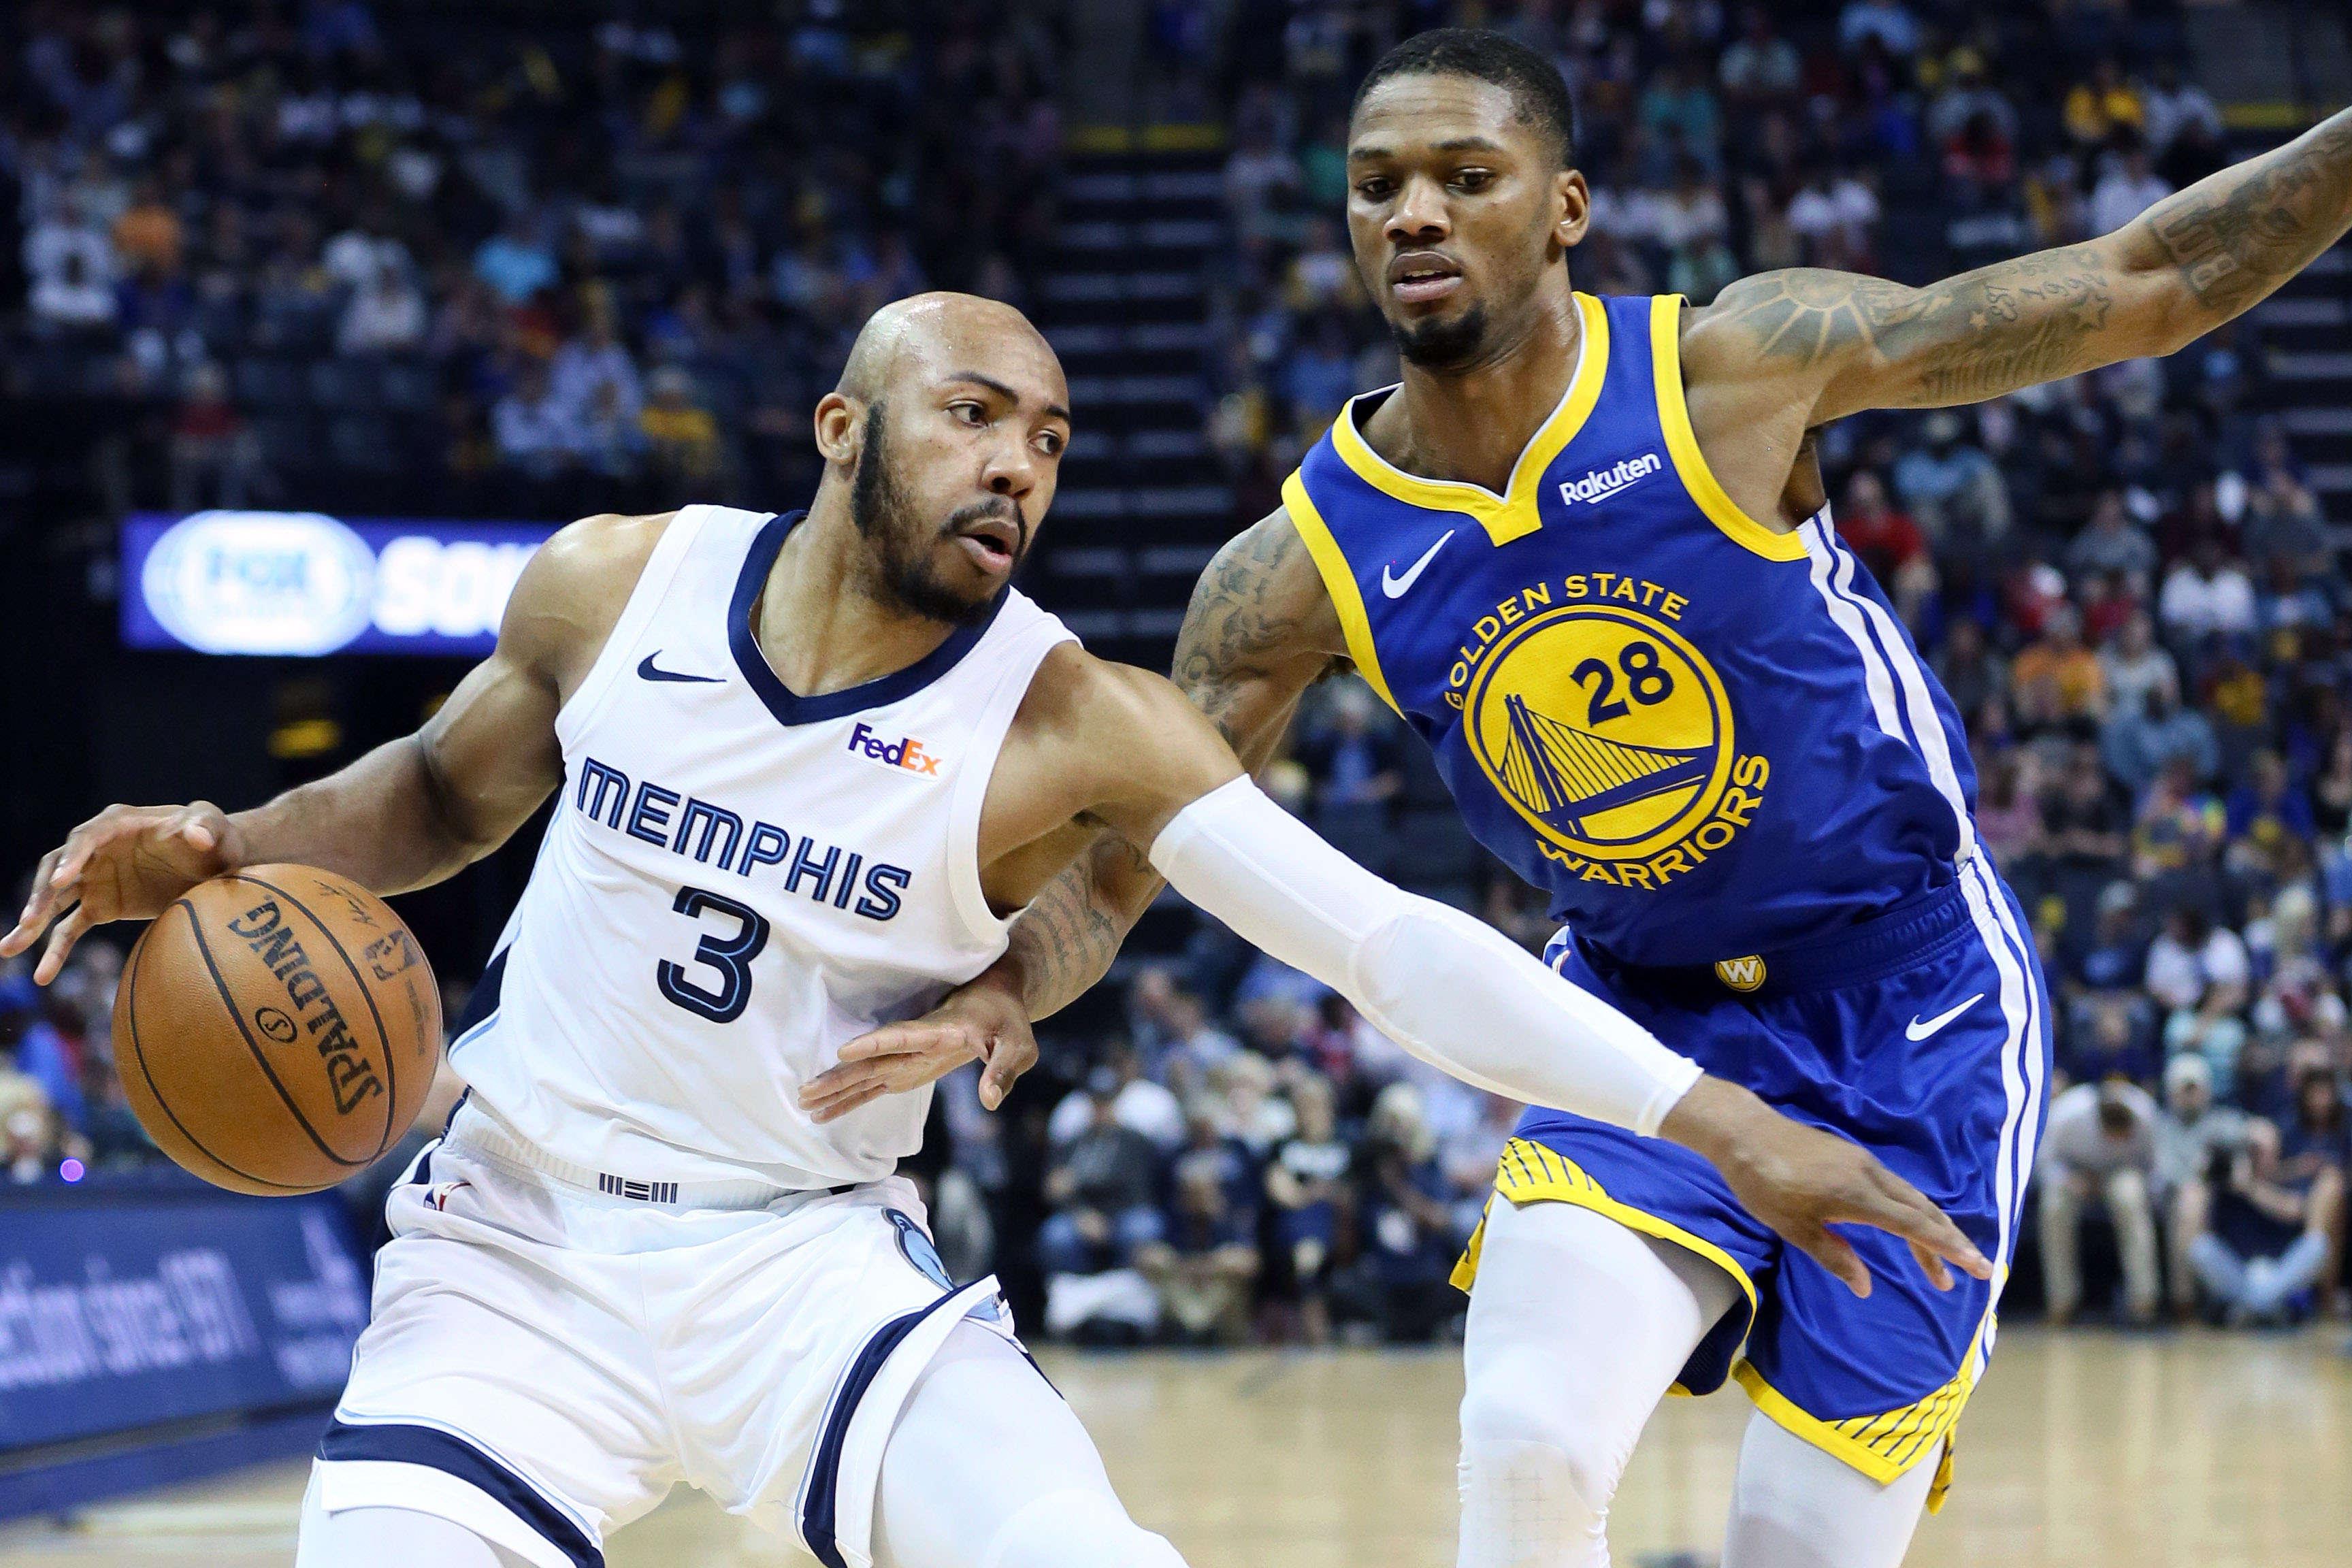 Memphis Grizzlies beat Golden State Warriors, 132-117